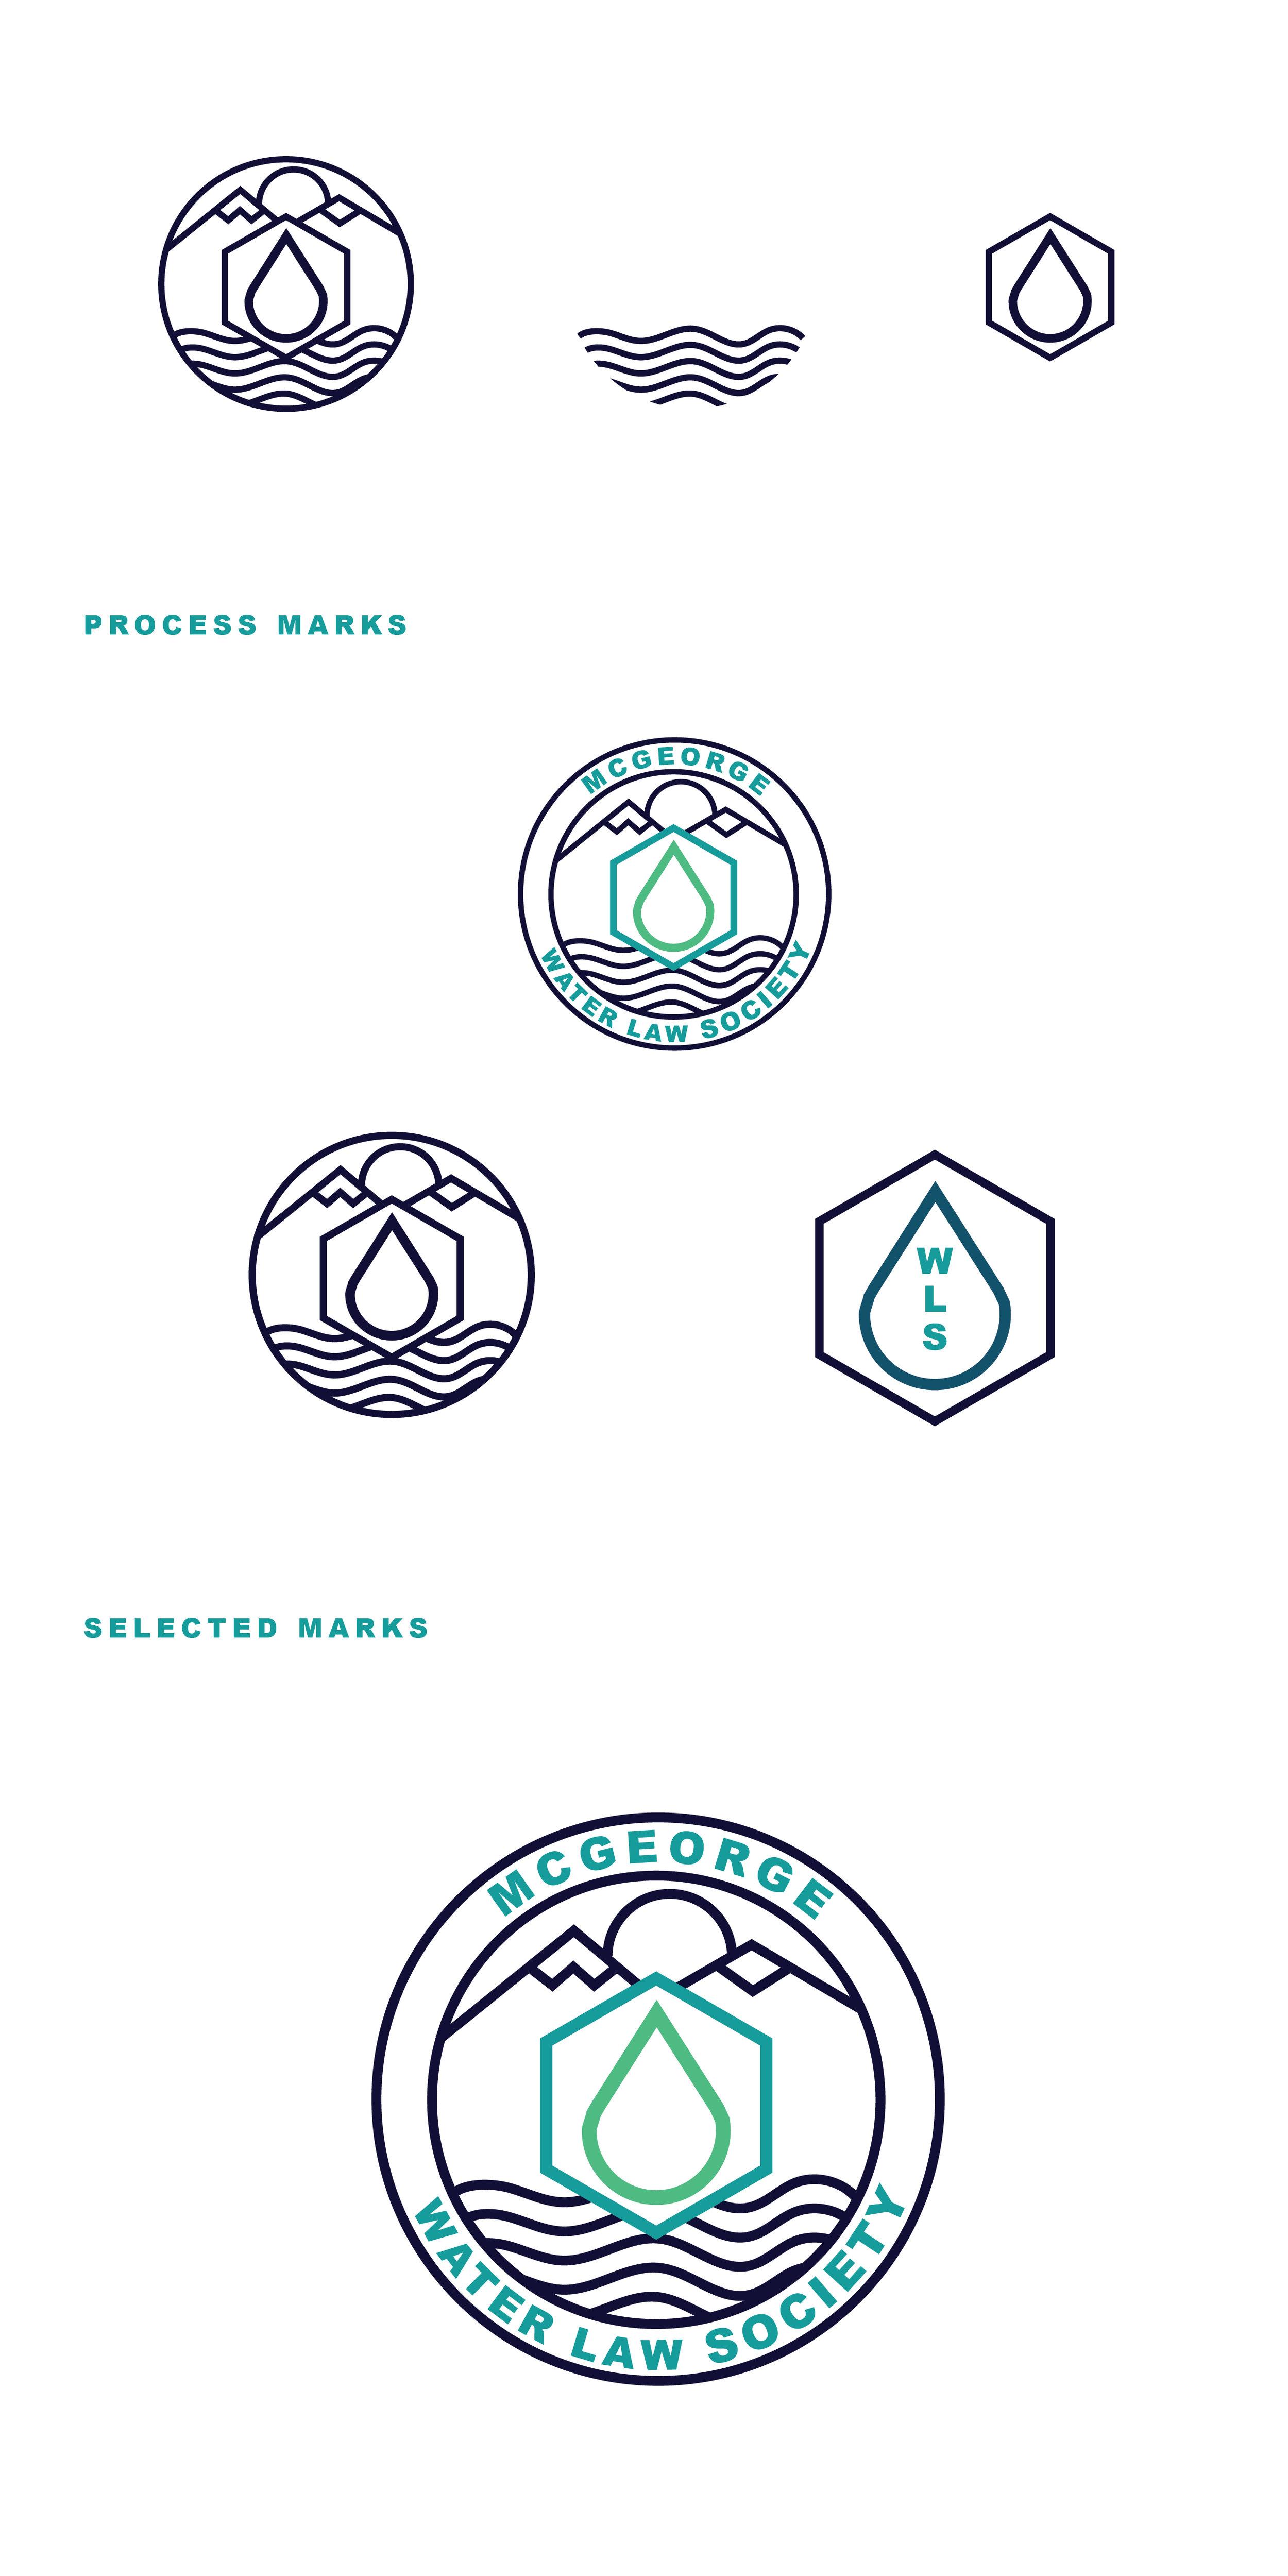 Water Law Mockup-01.jpg